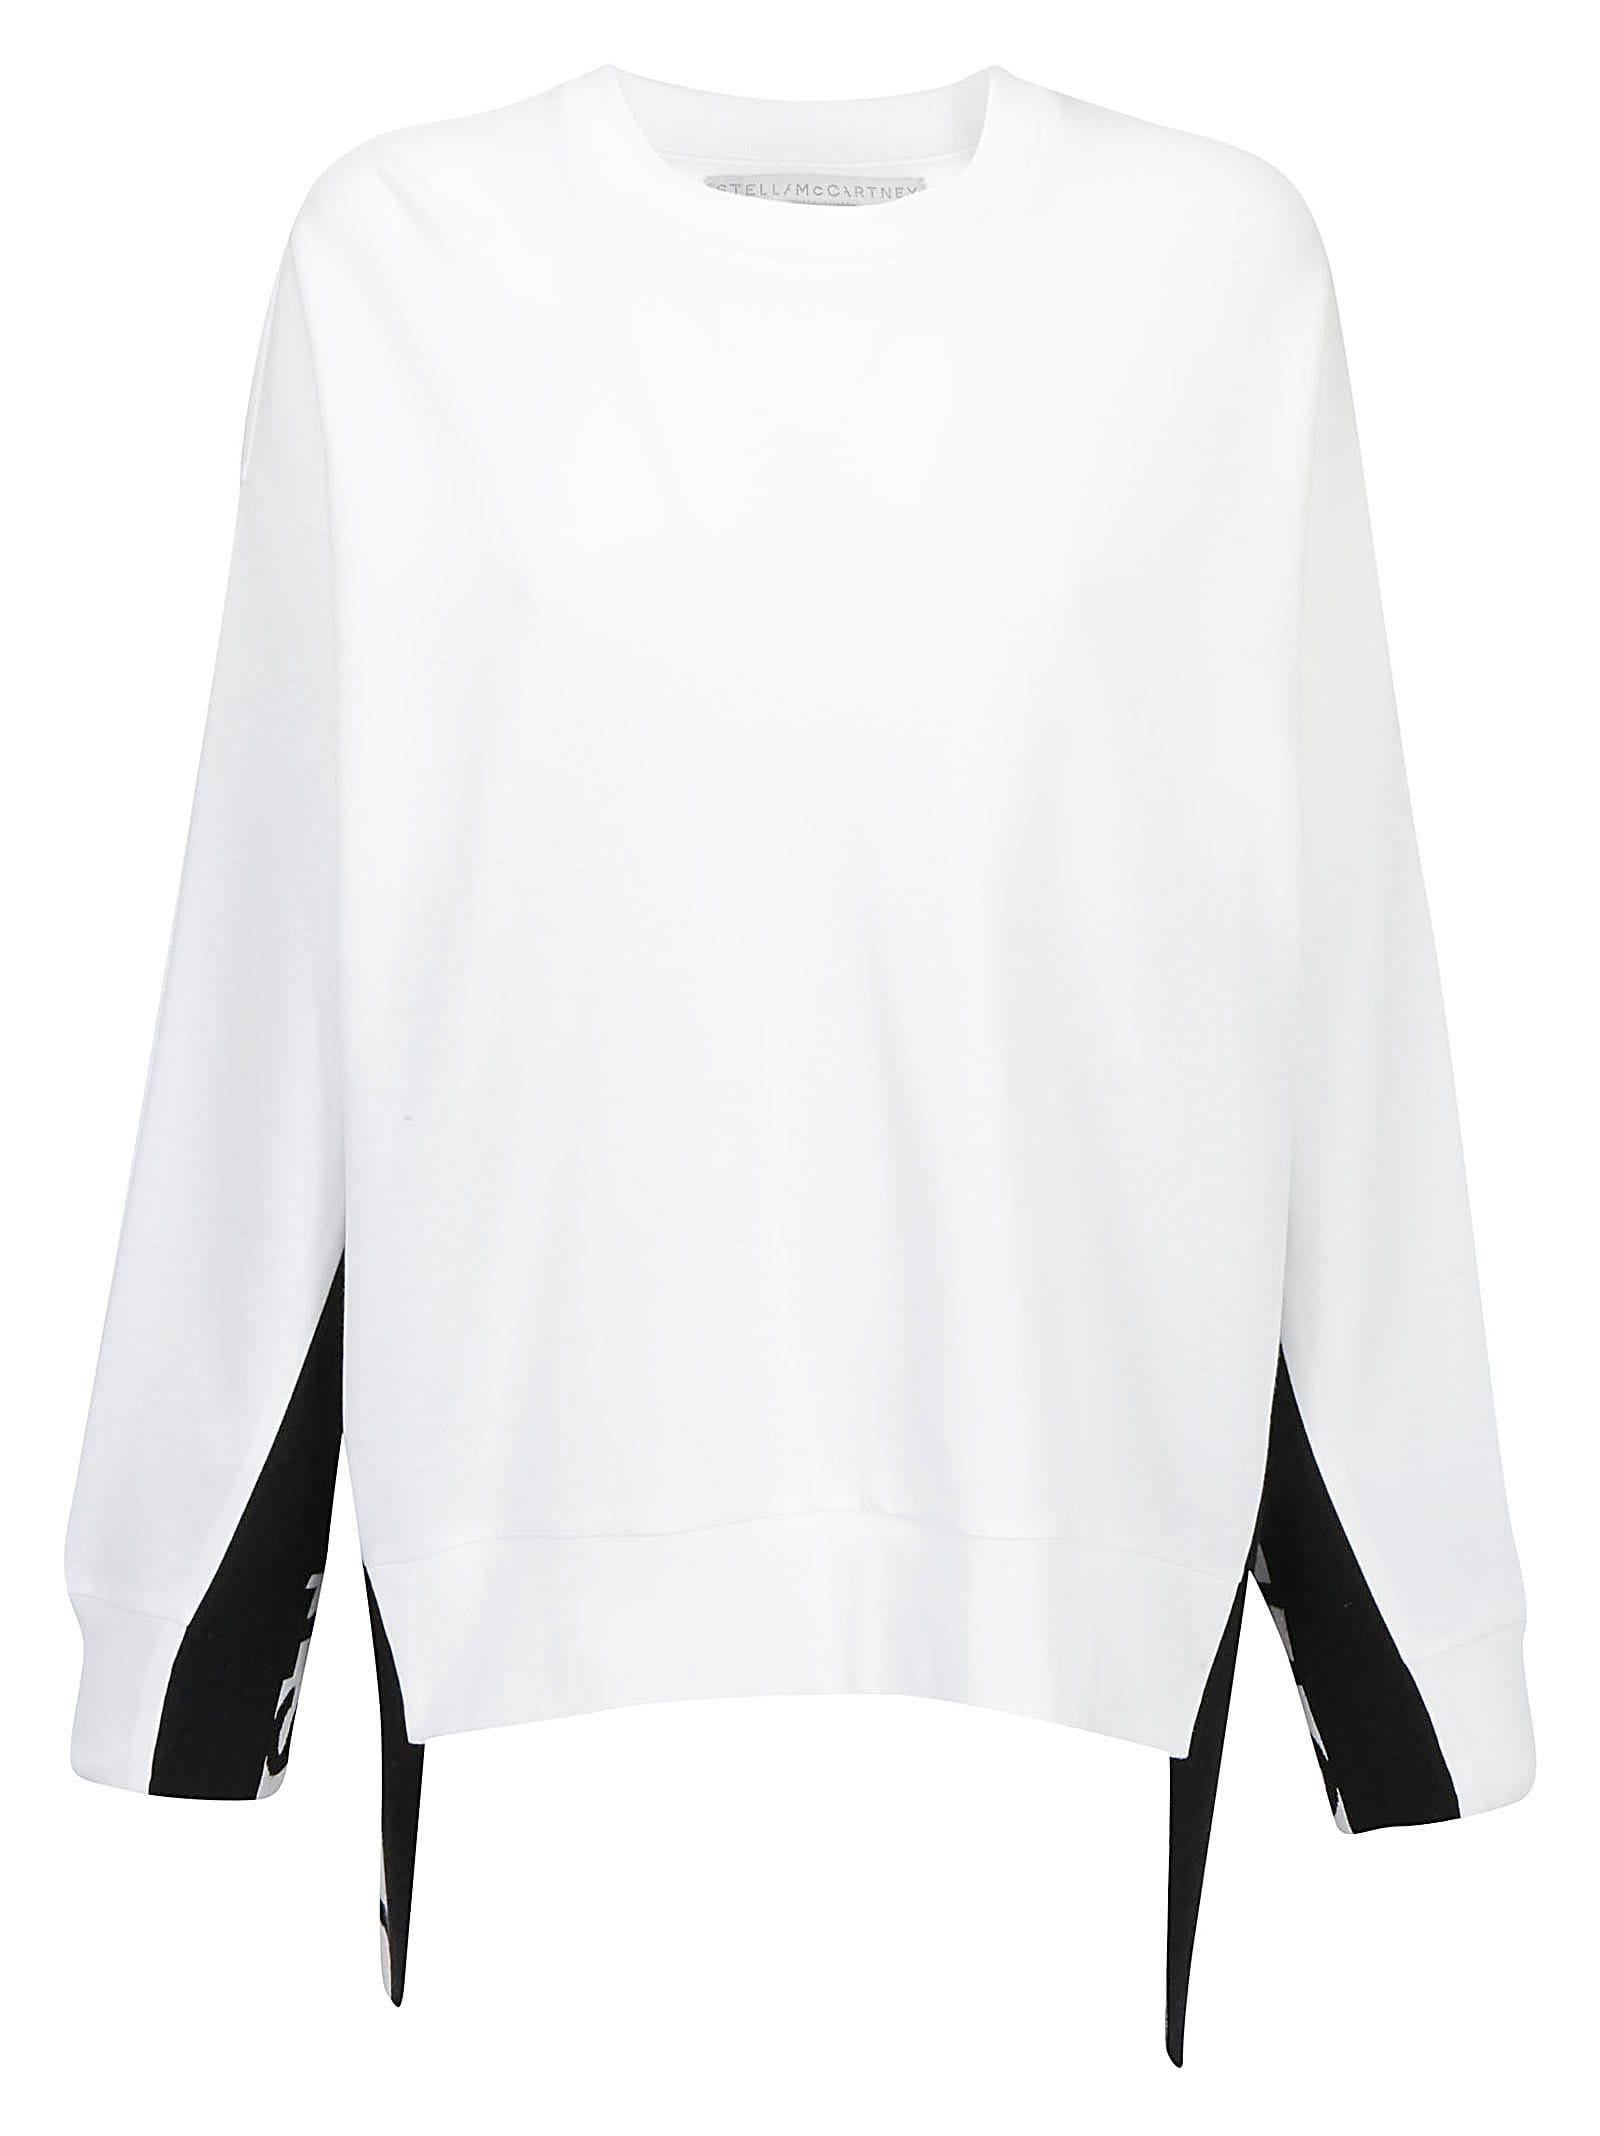 outlet for sale various kinds of 2020 Stella Mccartney Sweatshirt